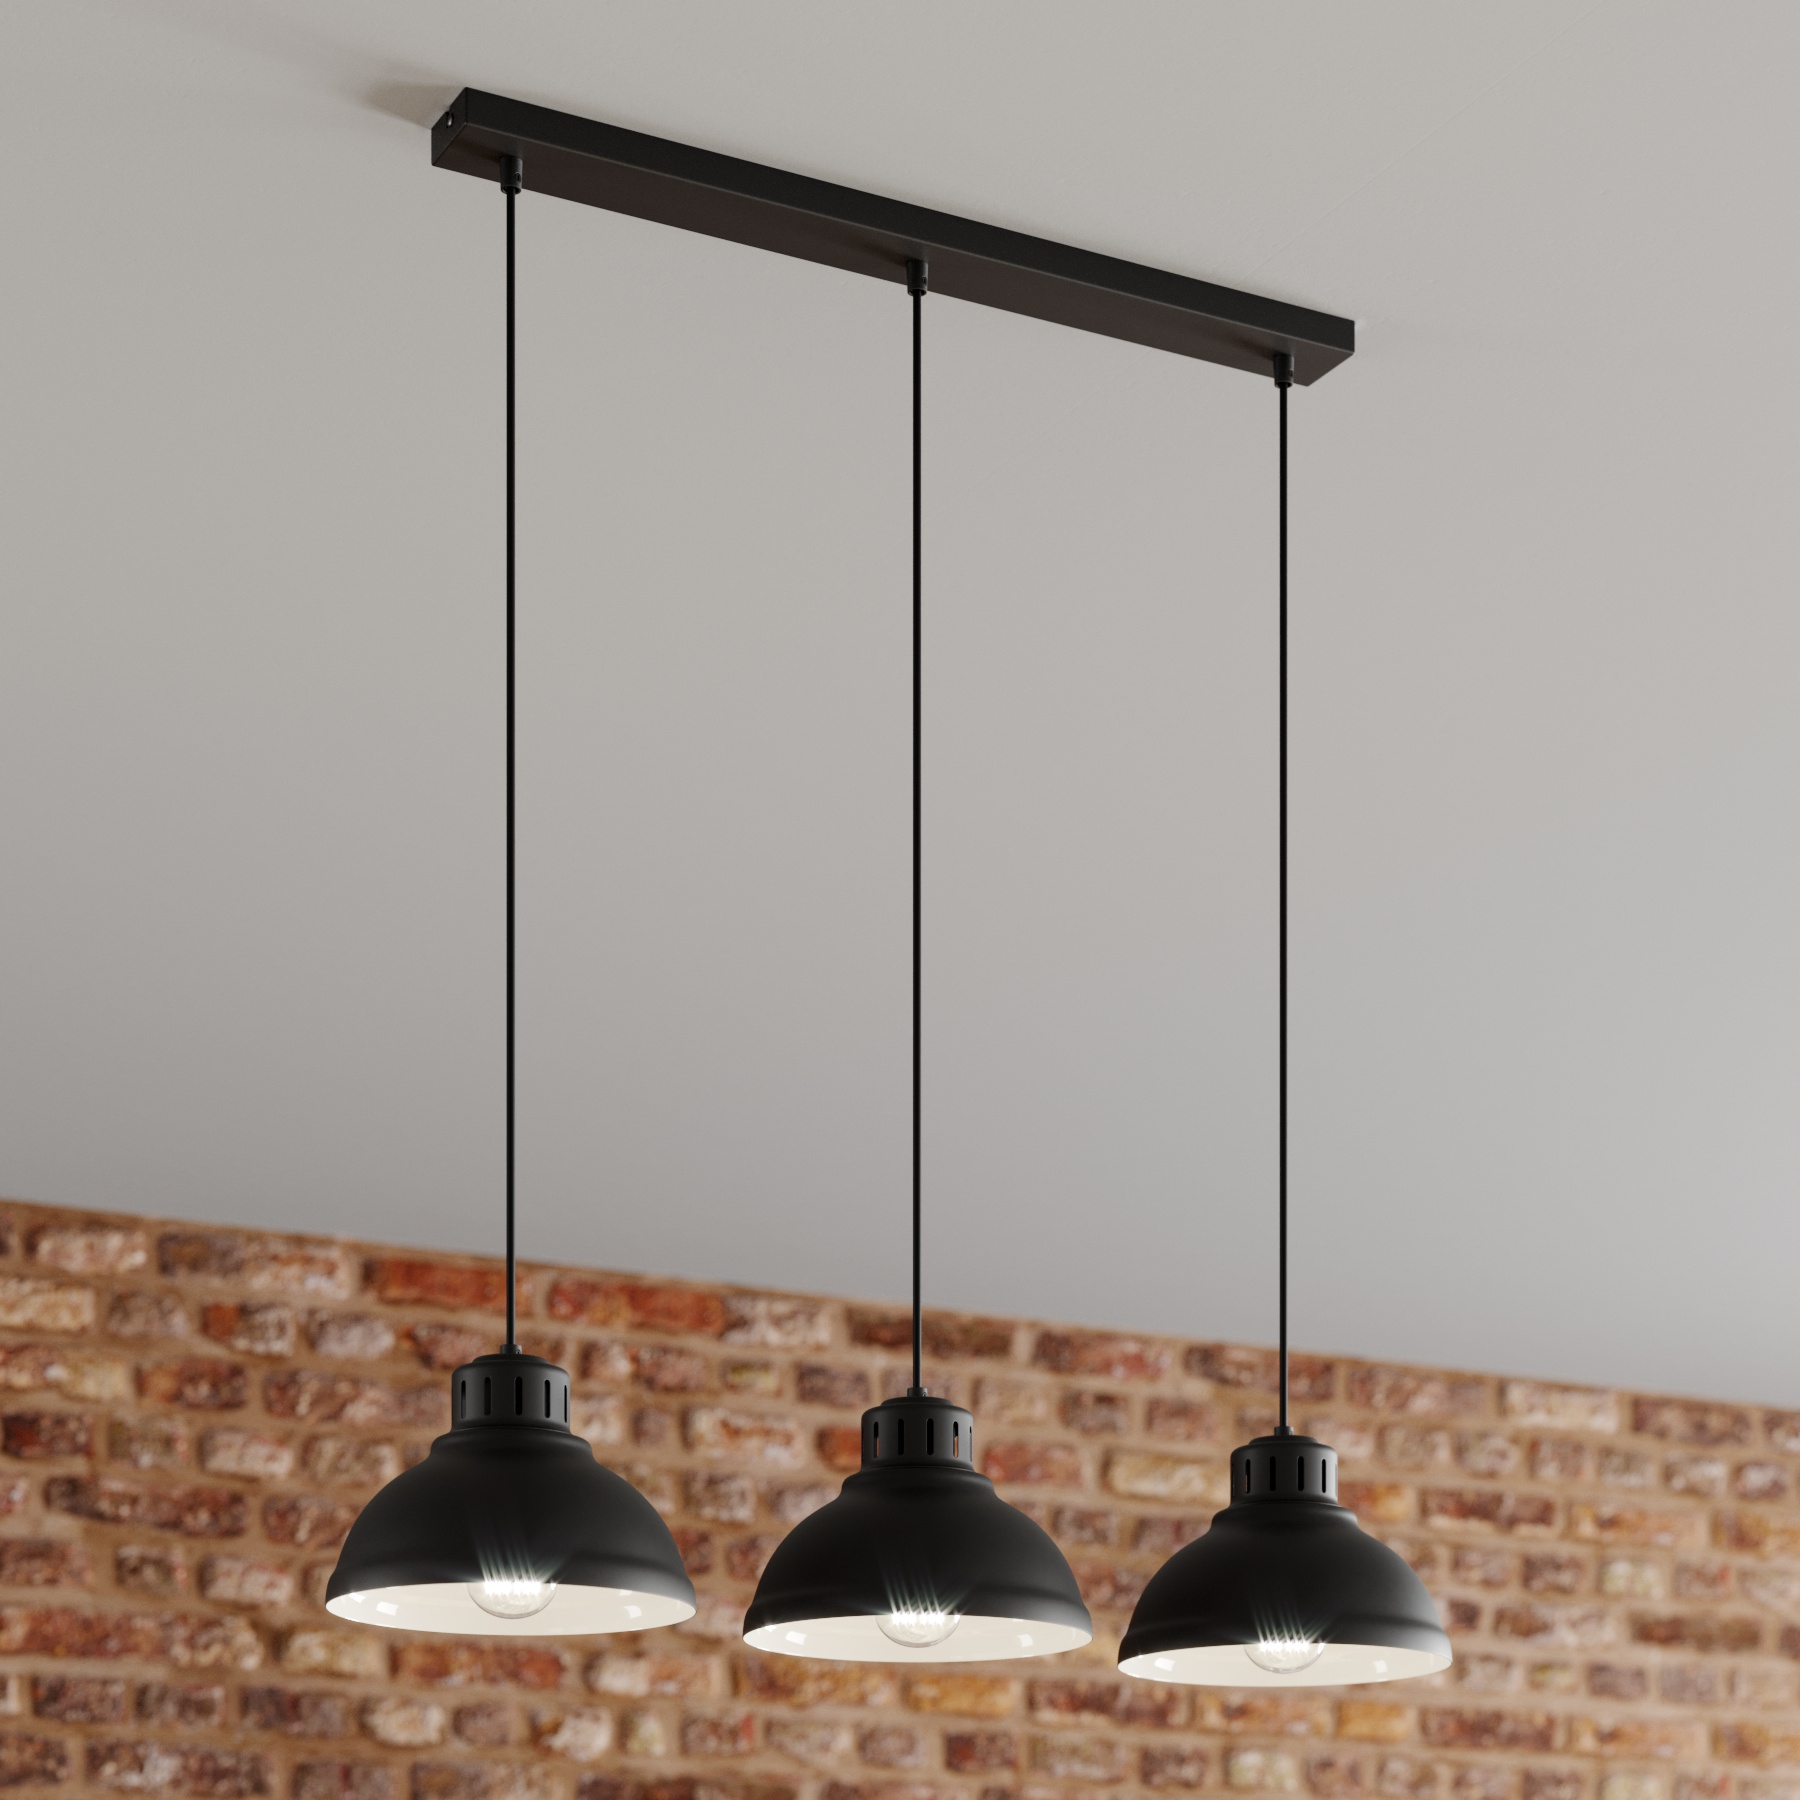 Lampa wisząca Sven, 3-punktowa, czarna